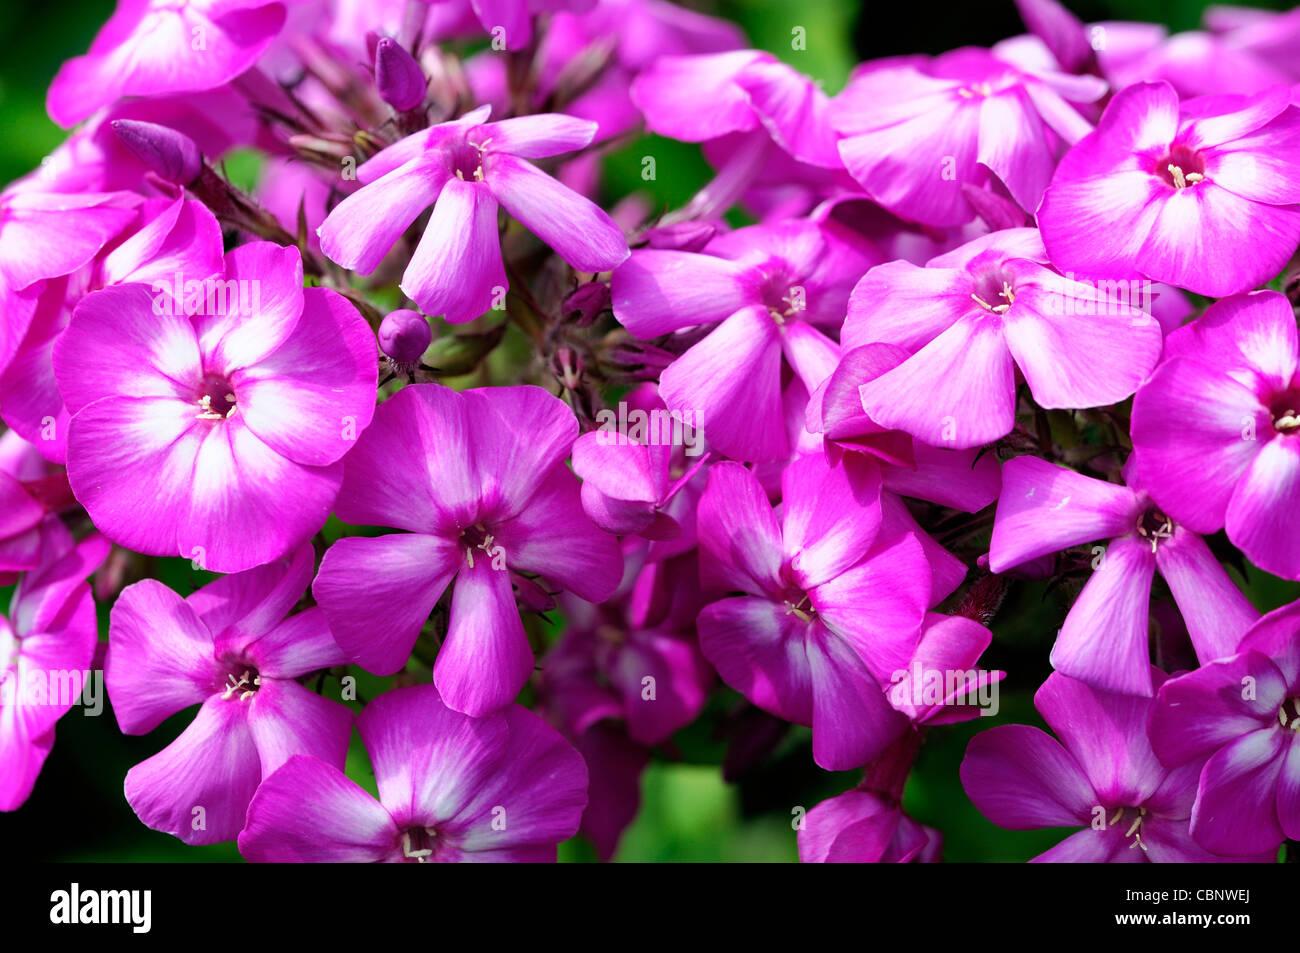 Phlox Paniculata Amethyst Garden Phlox Violet Purple Perennial Stock